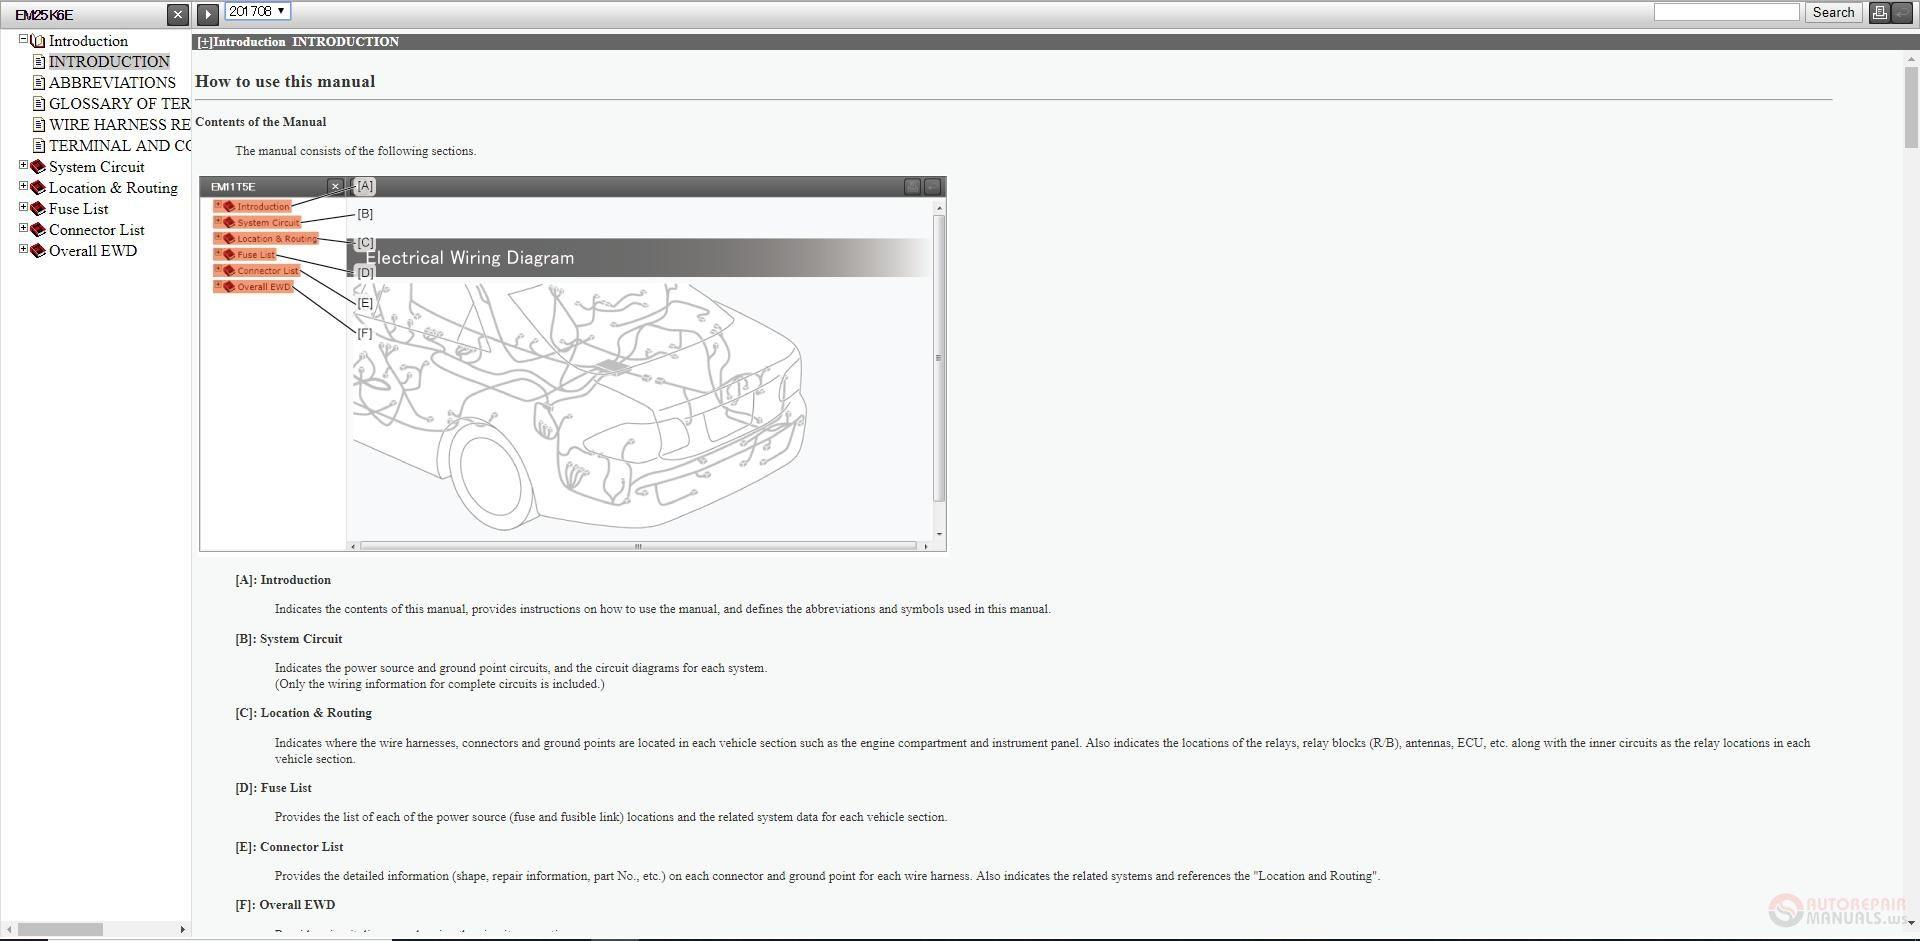 lexus ewd english electrical wiring diagram 2019 online - auto repair  software-auto epc software-auto repair manual-workshop manual-service manual-workshop